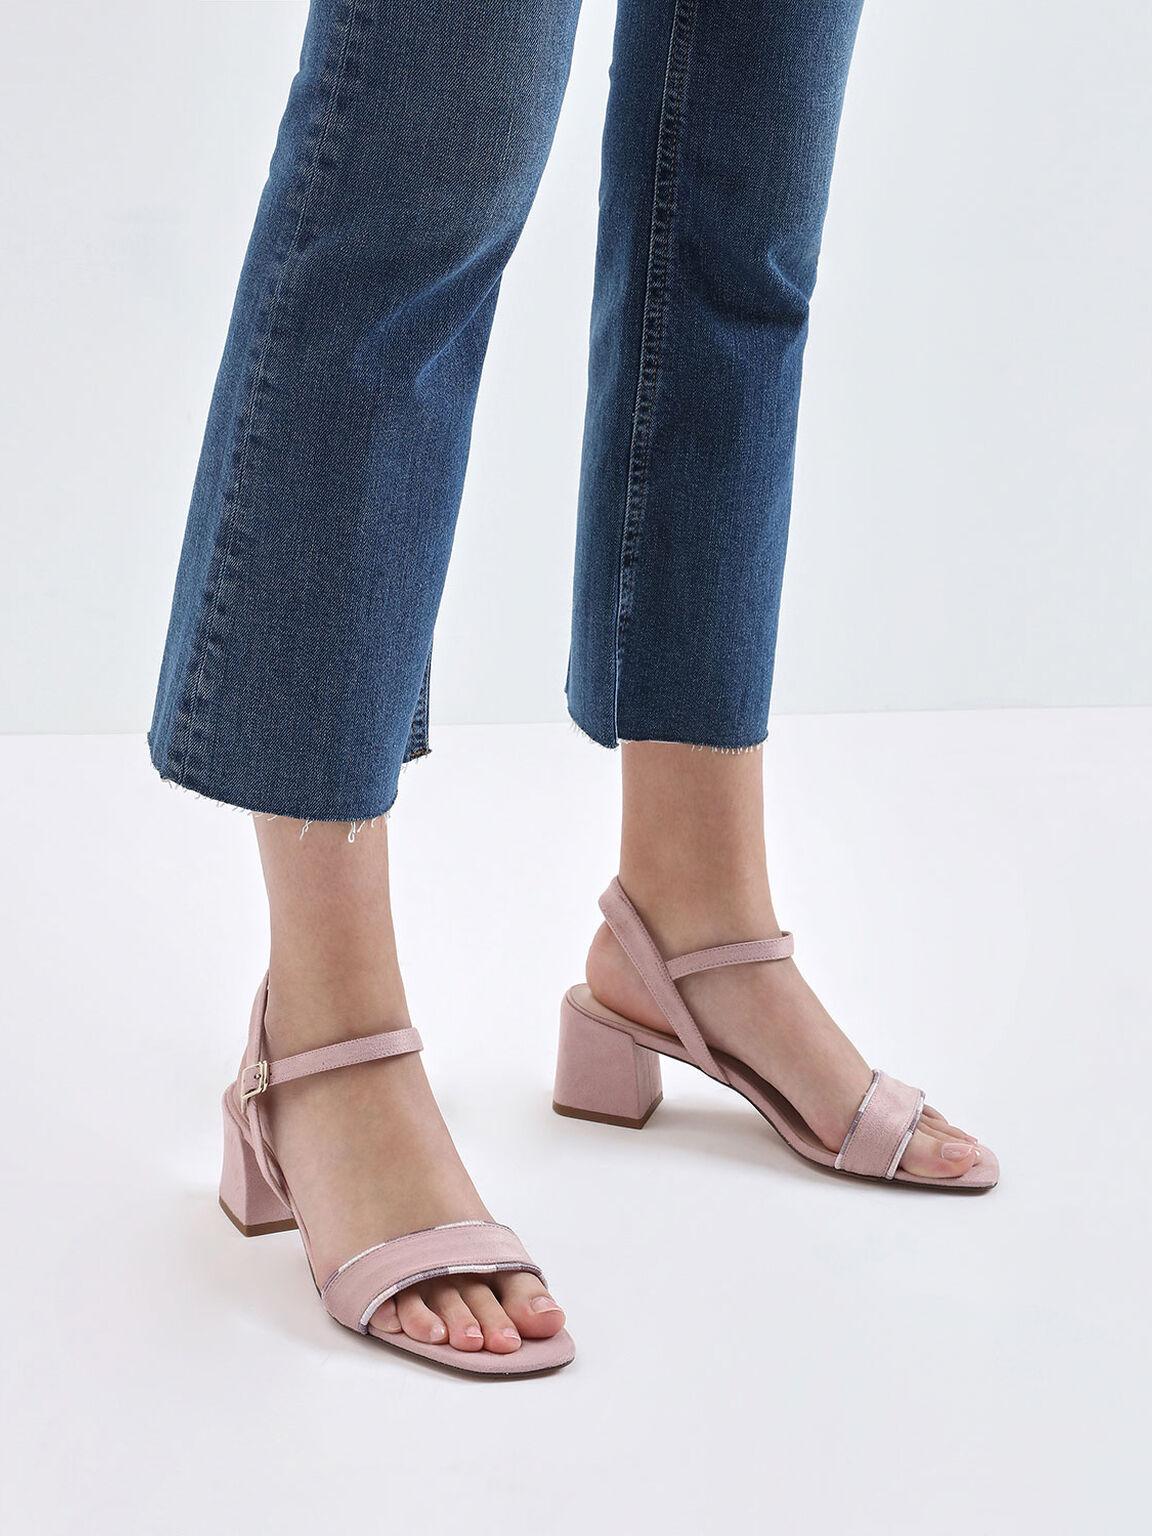 Two-Tone Thread Trim Textured Sandals, Lilac, hi-res